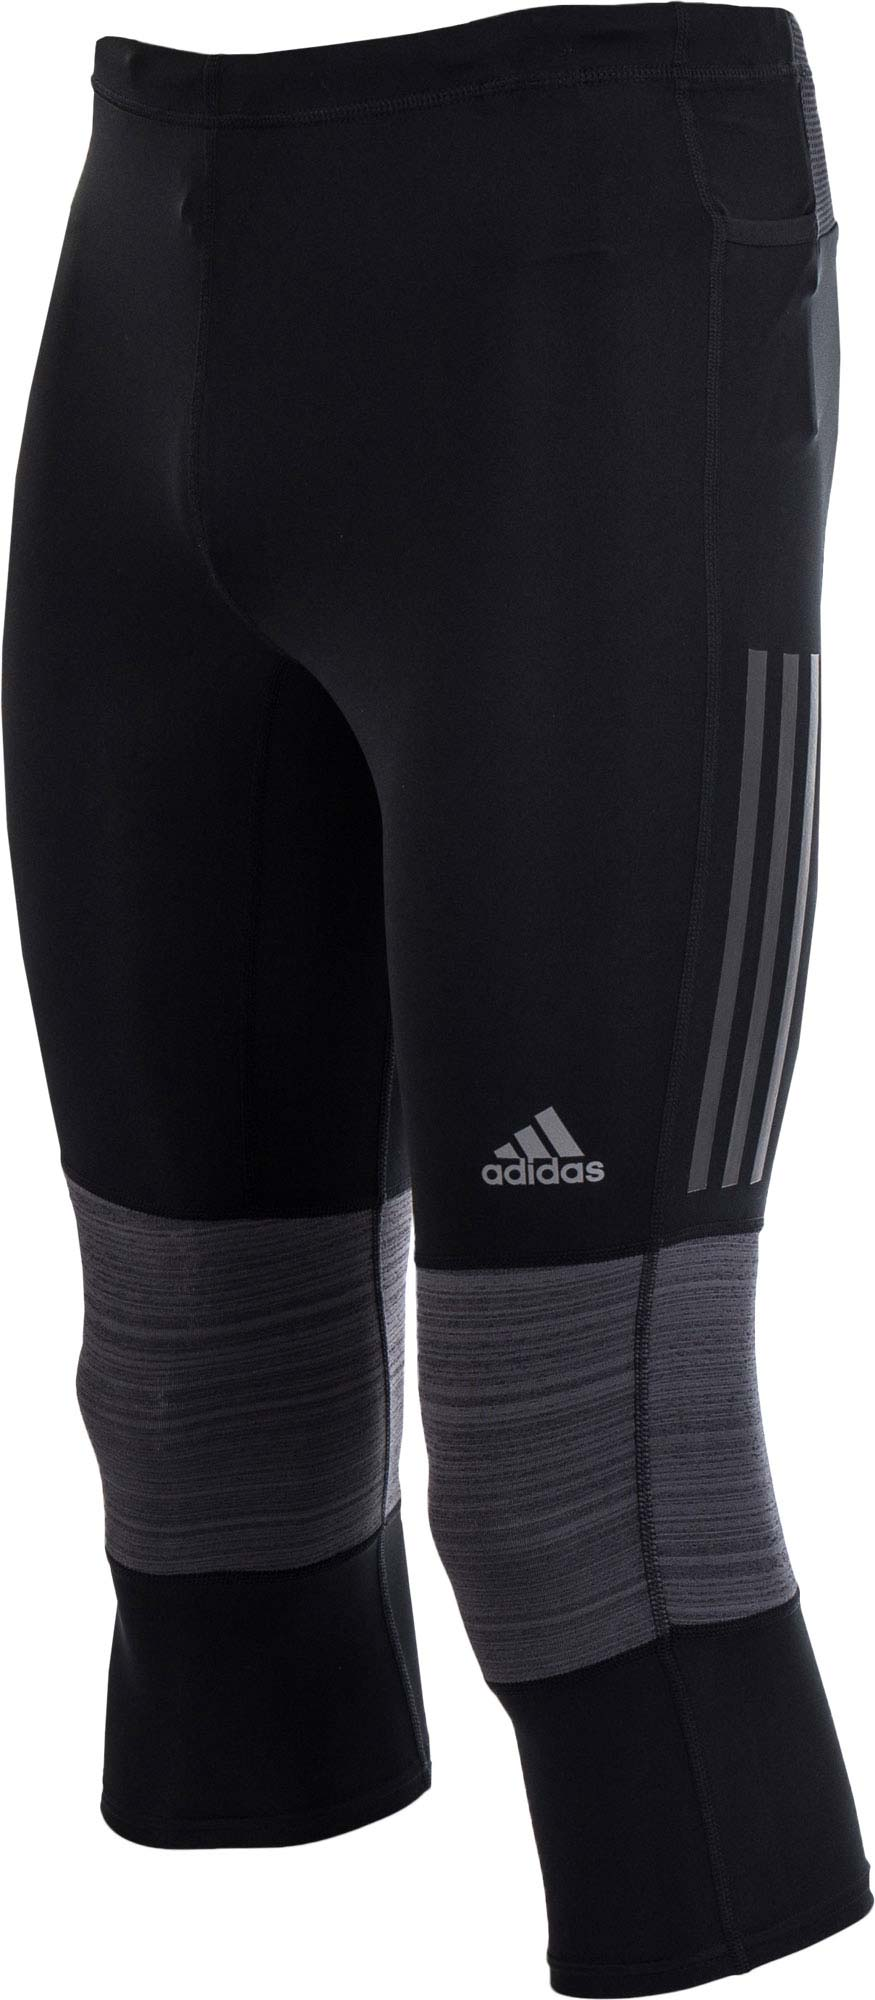 adidas SN 3/4 TIGHT M | sportisimo.cz